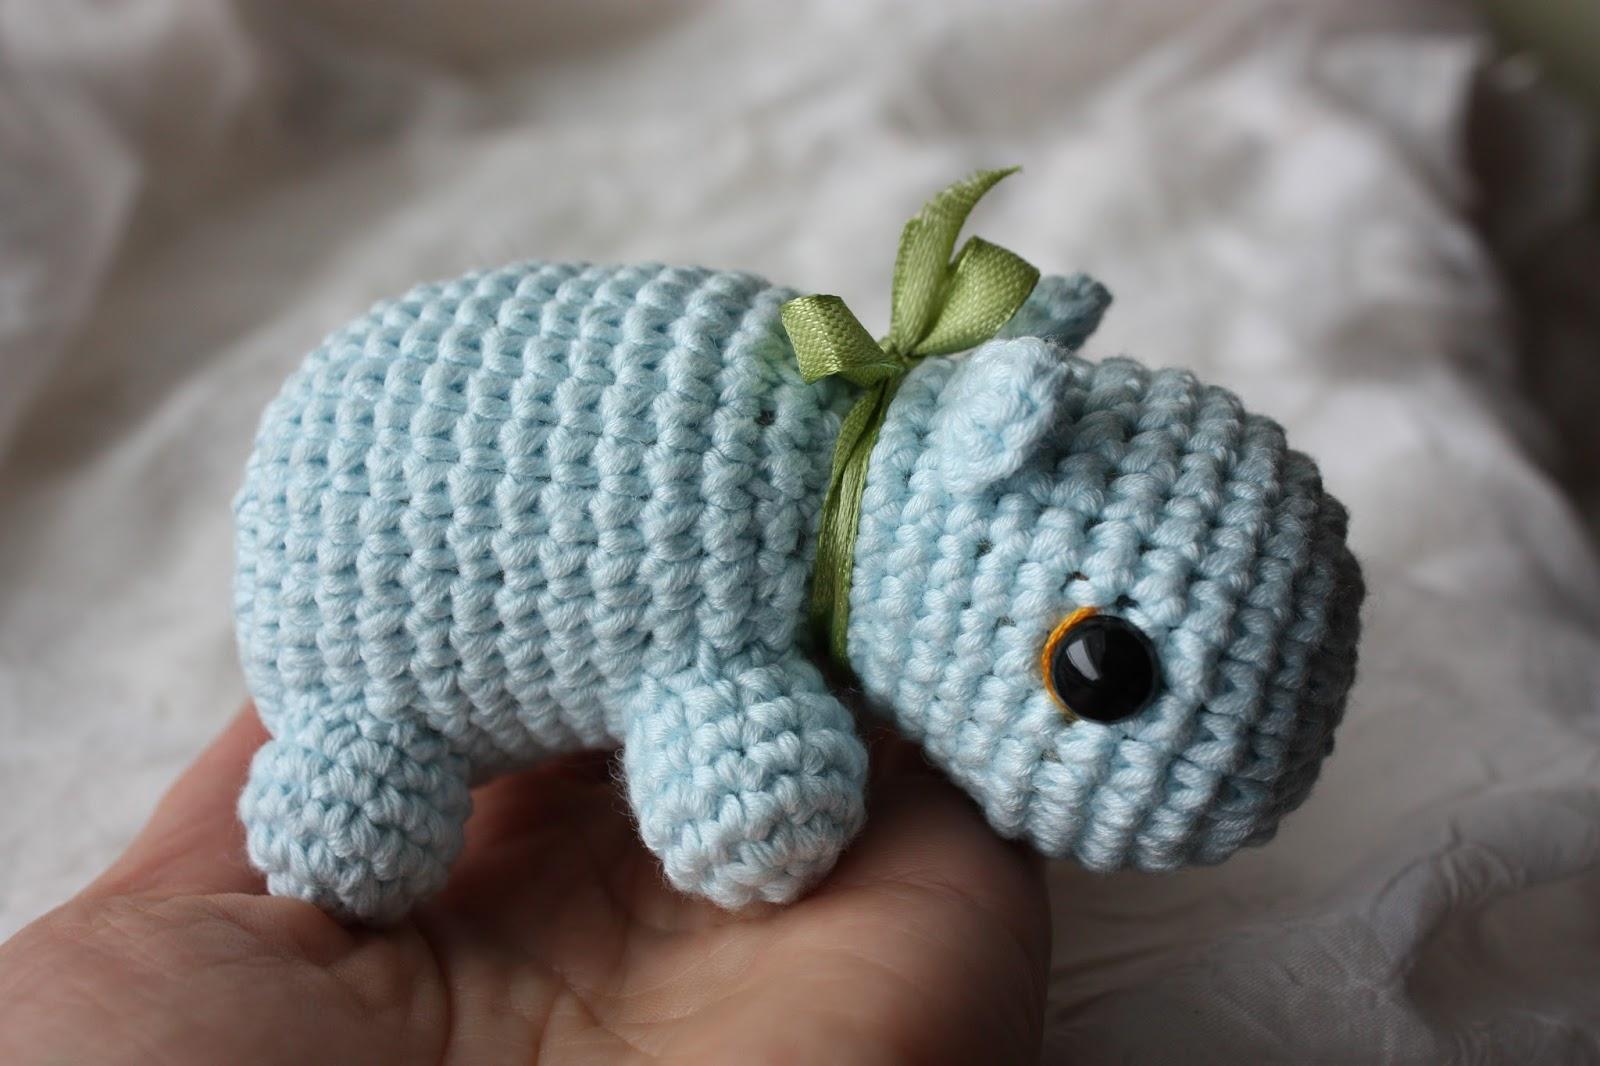 Amigurumi Hippopotamus : HAPPYAMIGURUMI: Amigurumi Hippo Pattern - PDF Amigurumi ...